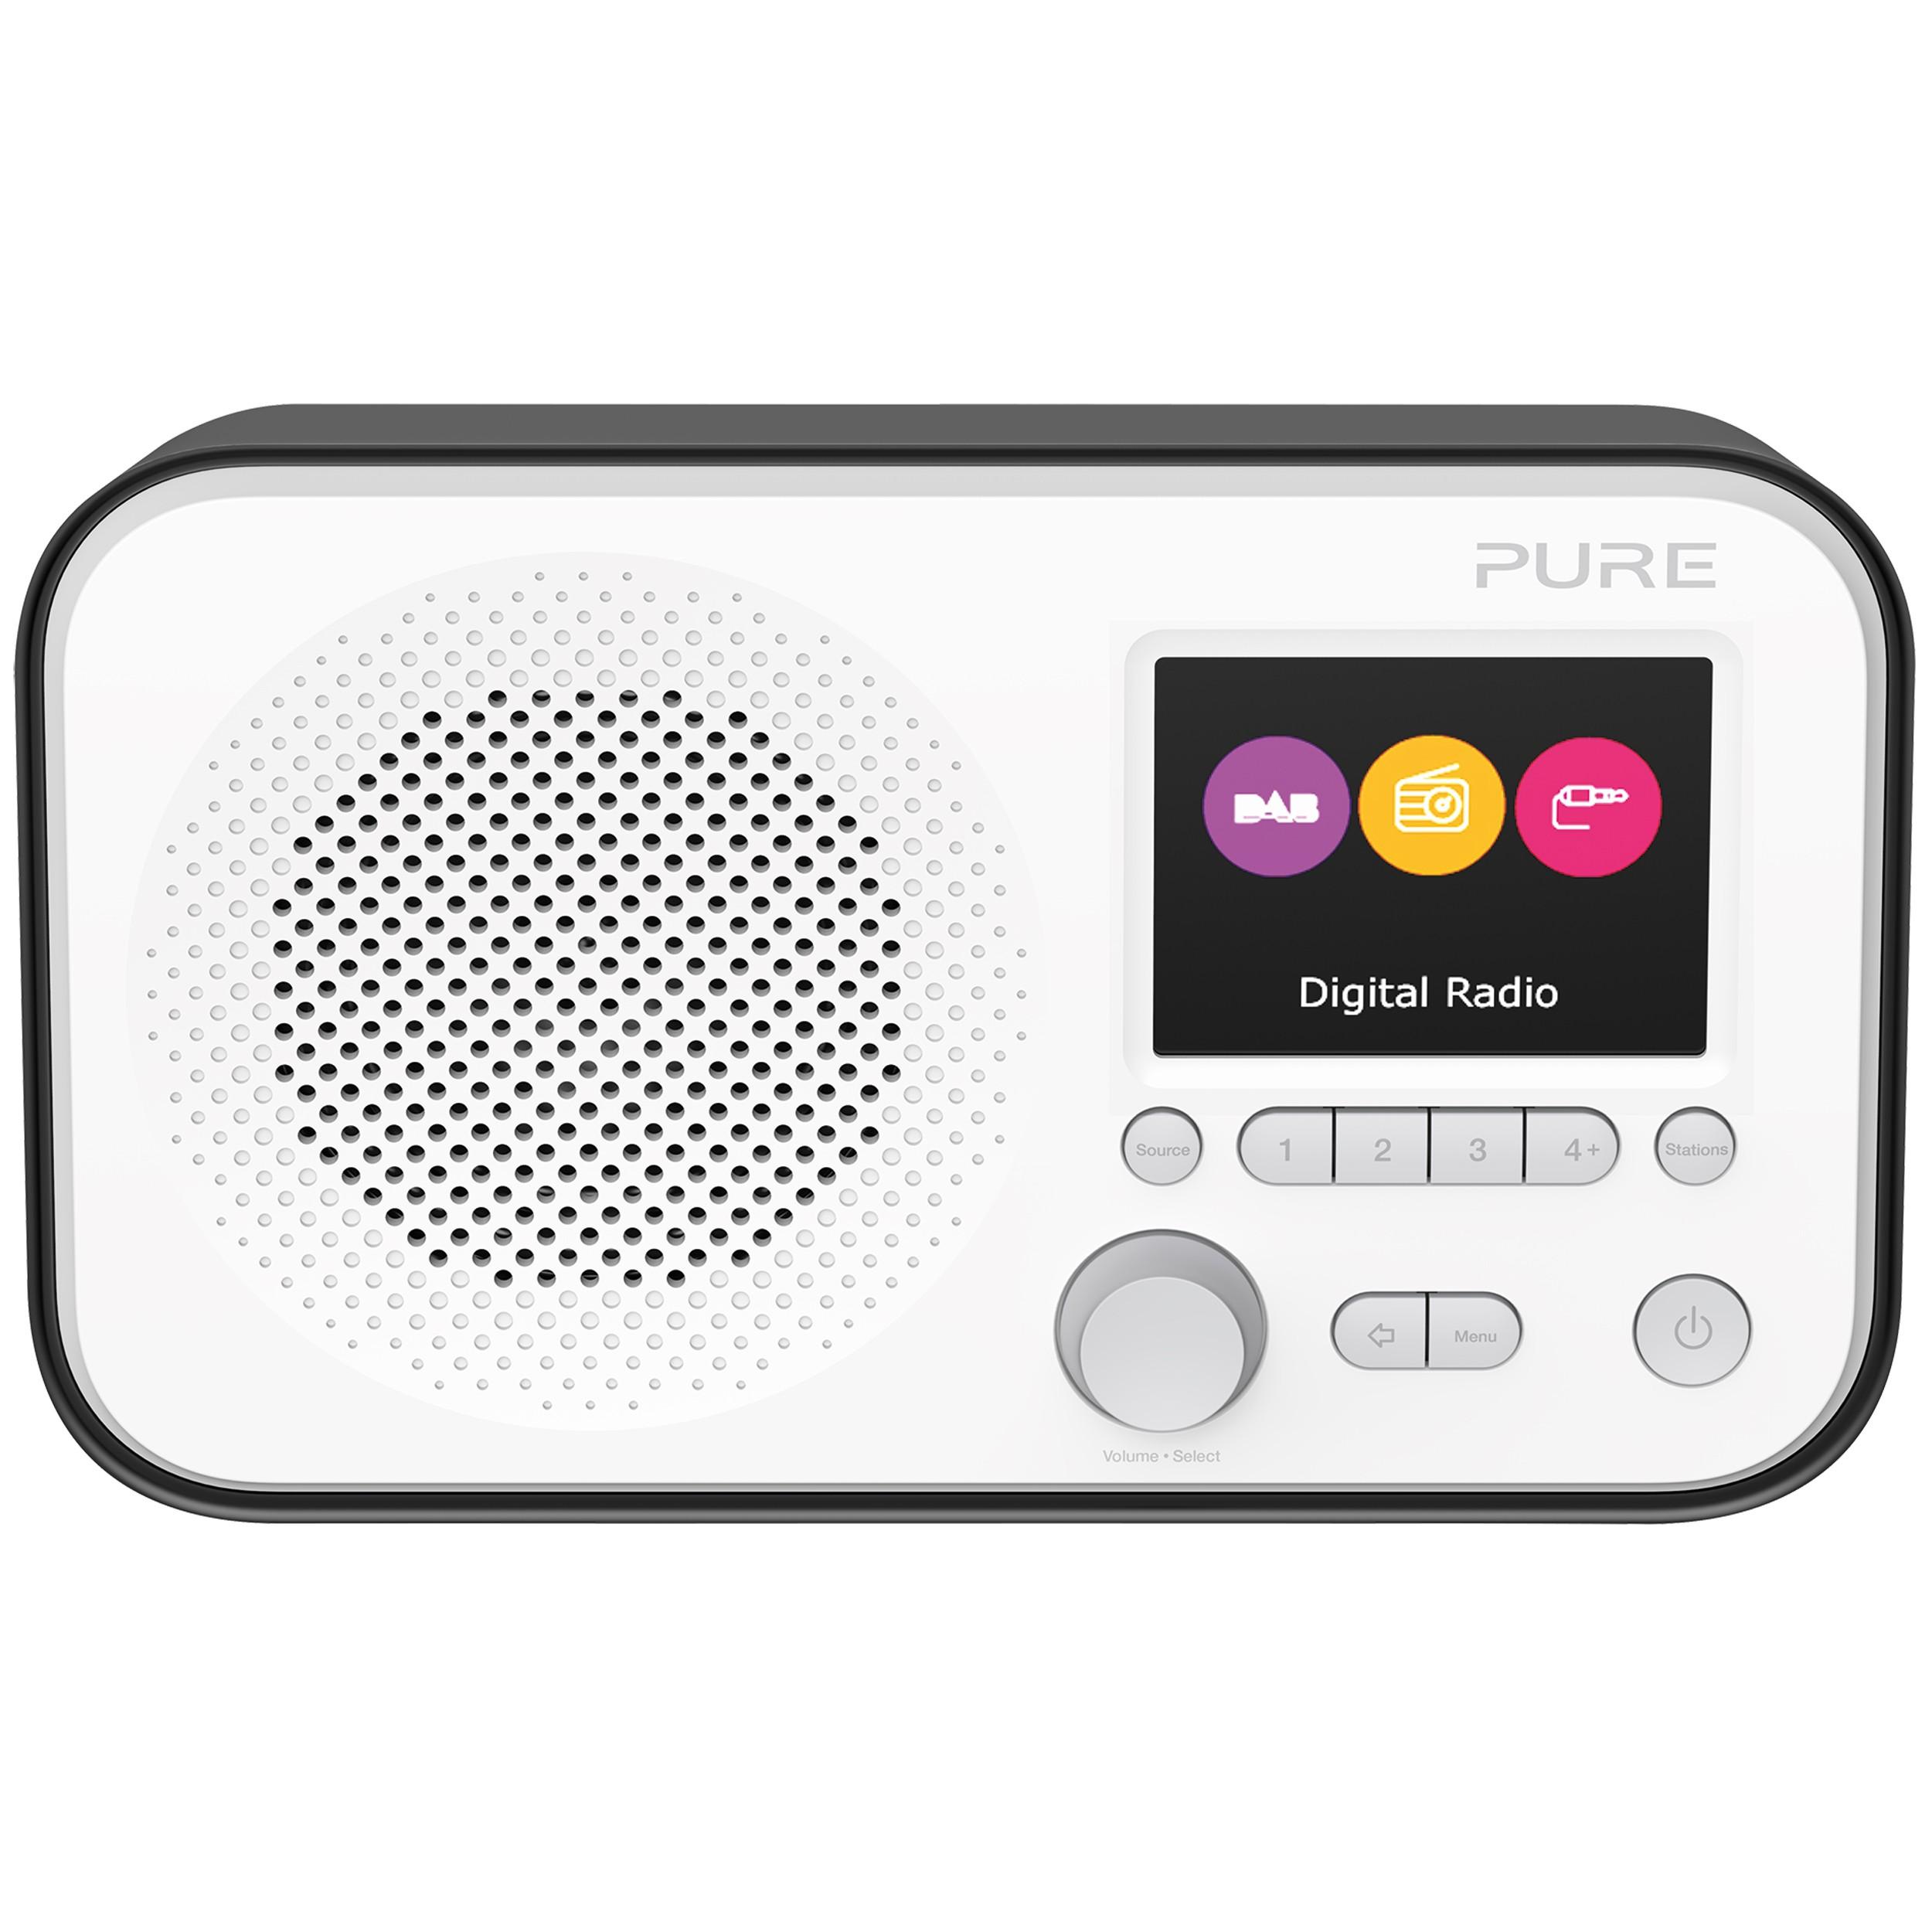 VL-62956 : Pure Elan E3 portabel DAB-radio (sort)